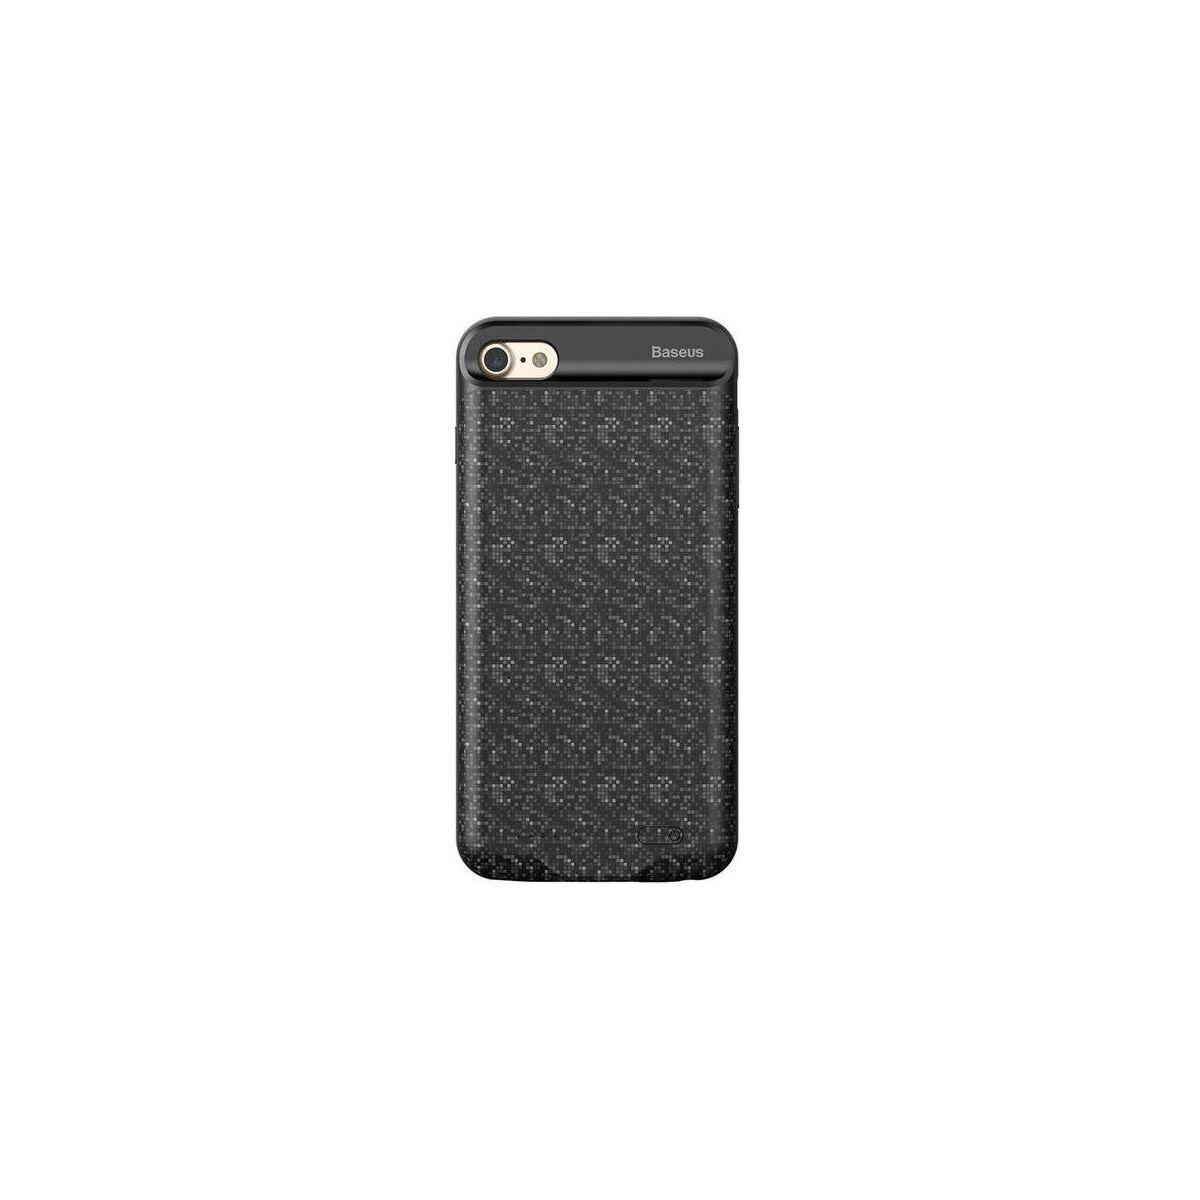 Baseus Power Bank tok, Plaid Backpack 5000 mAh iPhone 6/6s, fekete (ACAPIPH6S-LBJ01)